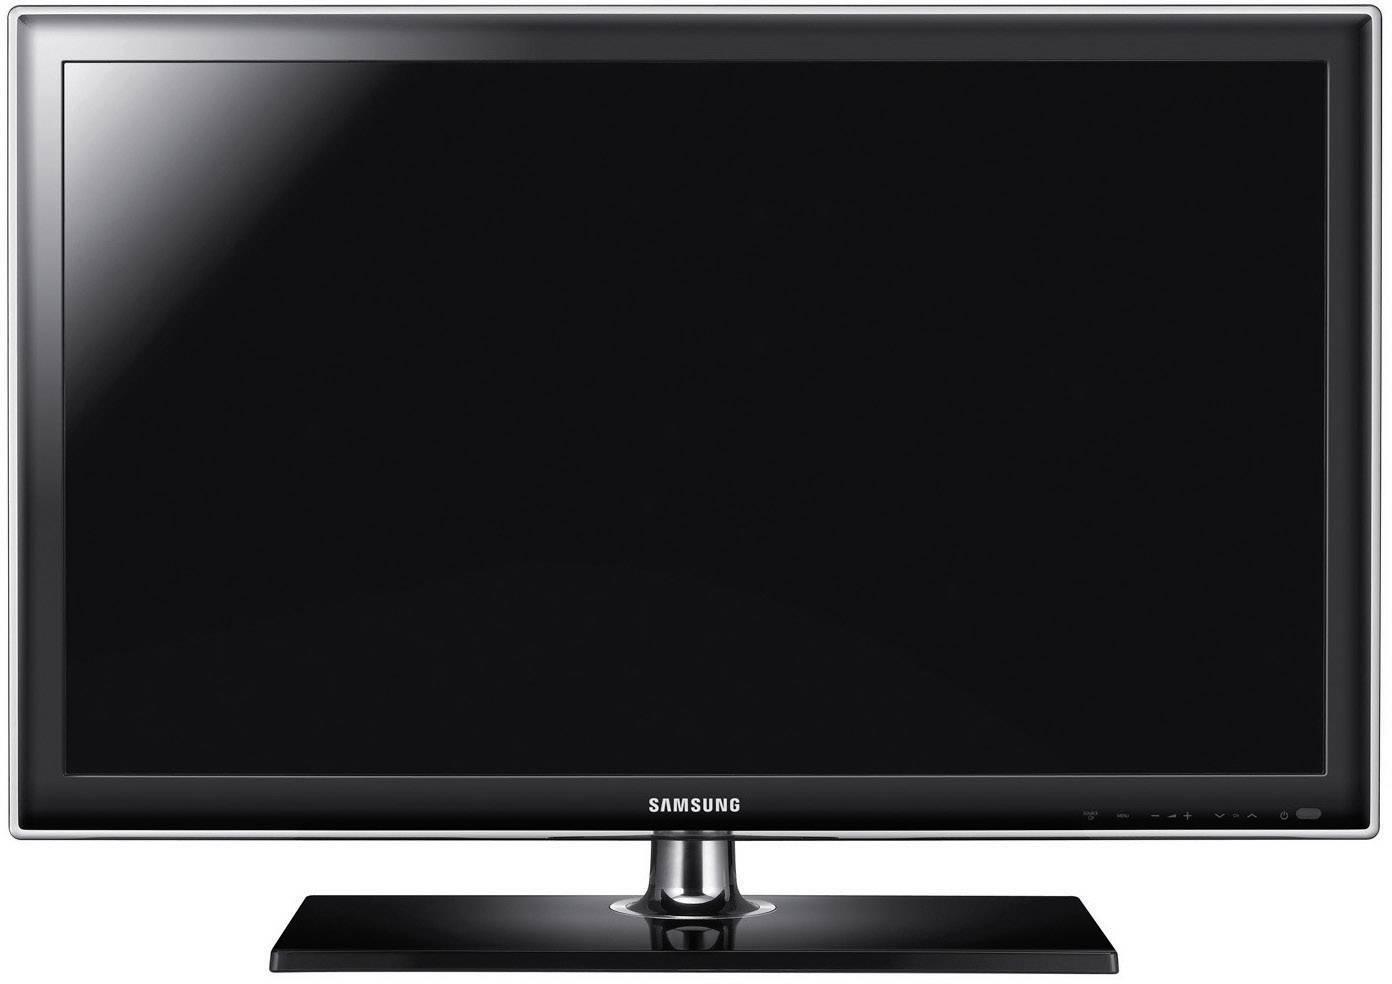 Samsung Ue22d5000 Led Tv 54 Cm 22 Inch 1920 X 1080 Full Hd 5 Ms Rh Conrad  Com Samsung Helpdesk Tv Nederland Samsung Tv Helpdesk